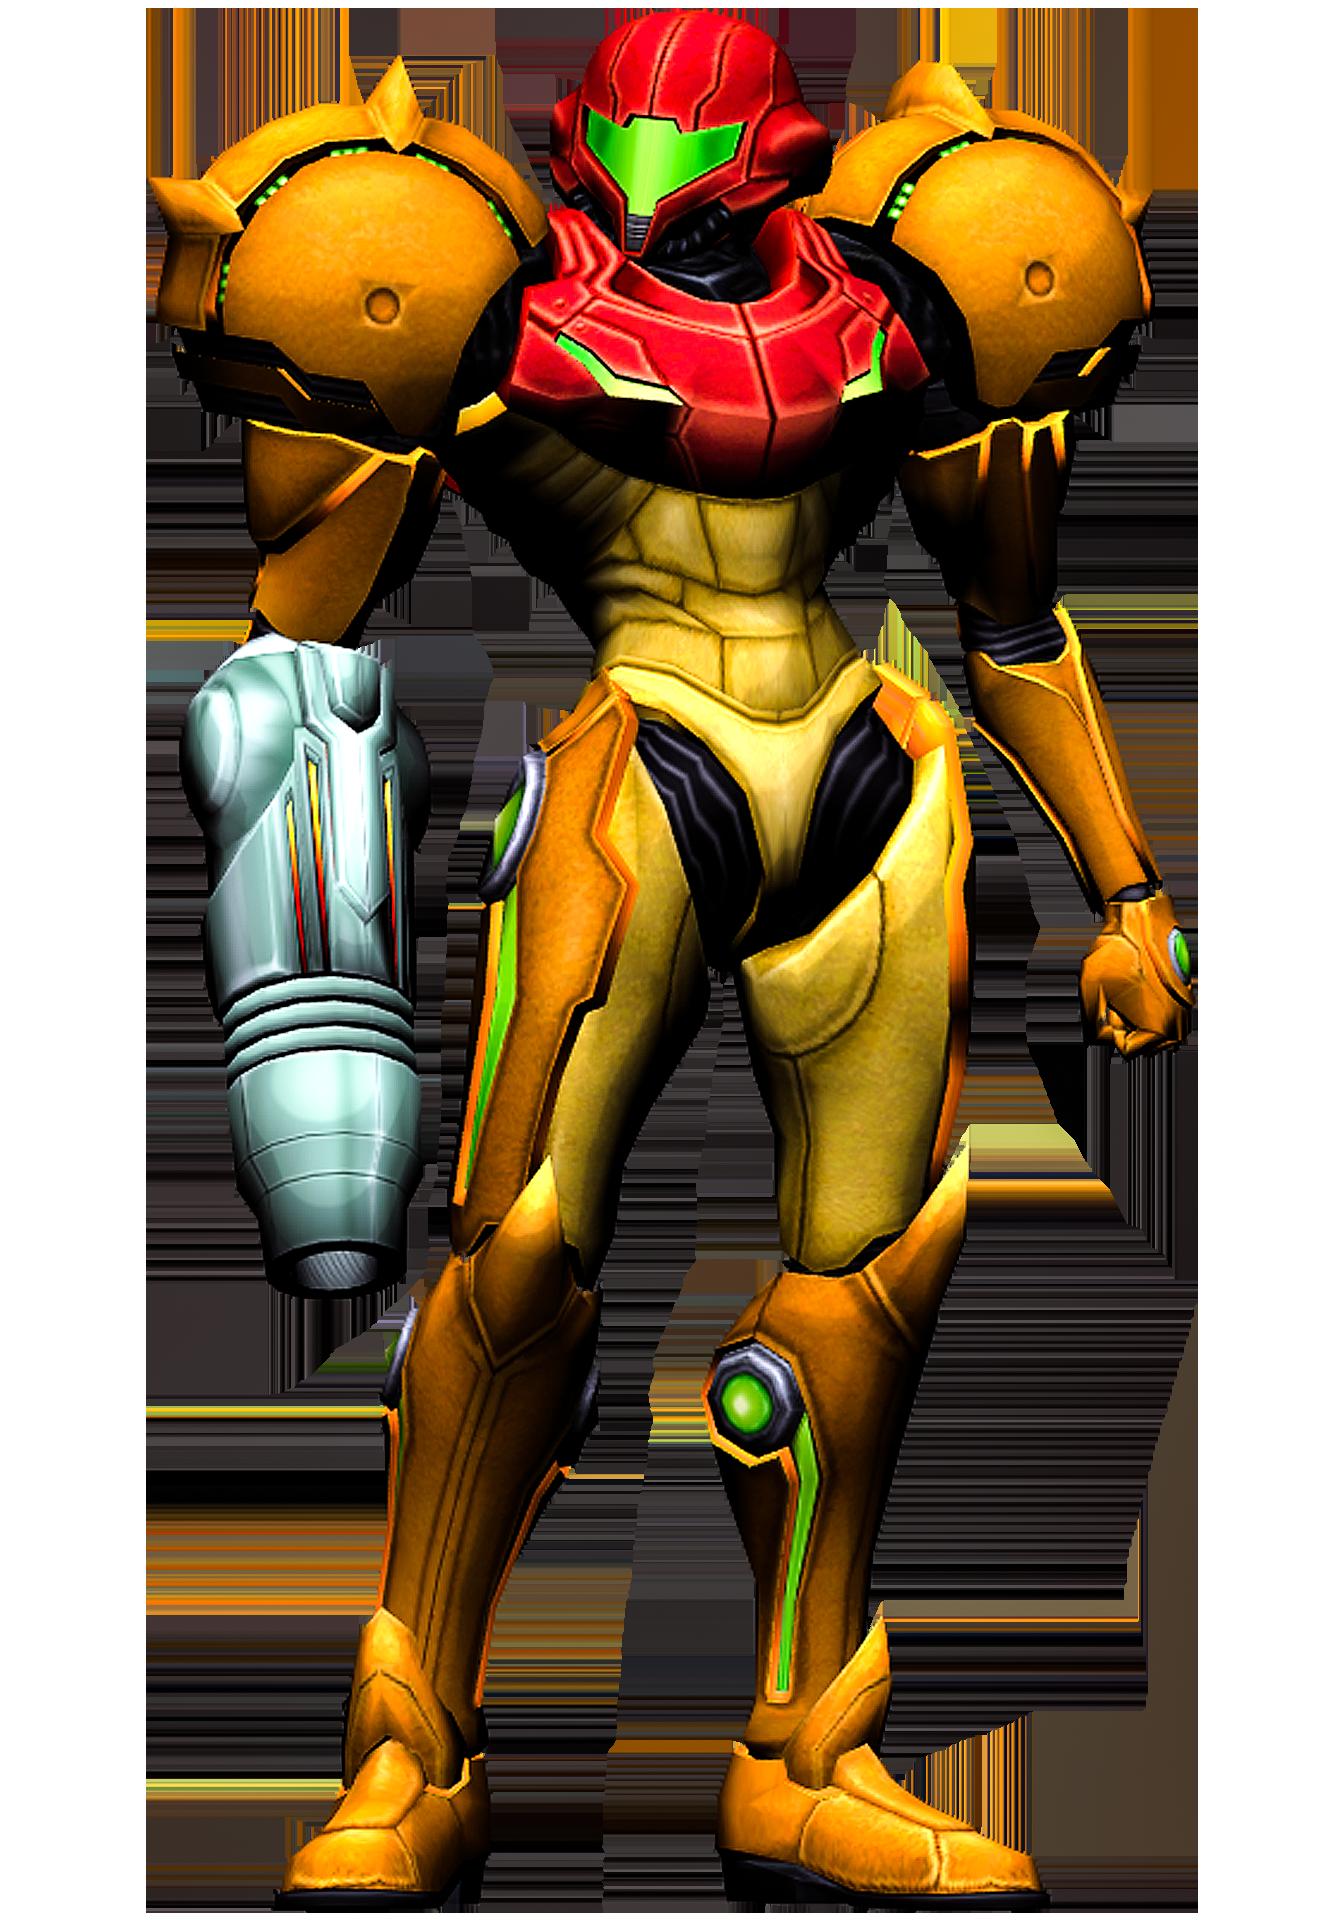 Samus Aran - Metroid Prime Comic Pose Render Pack by Varia31